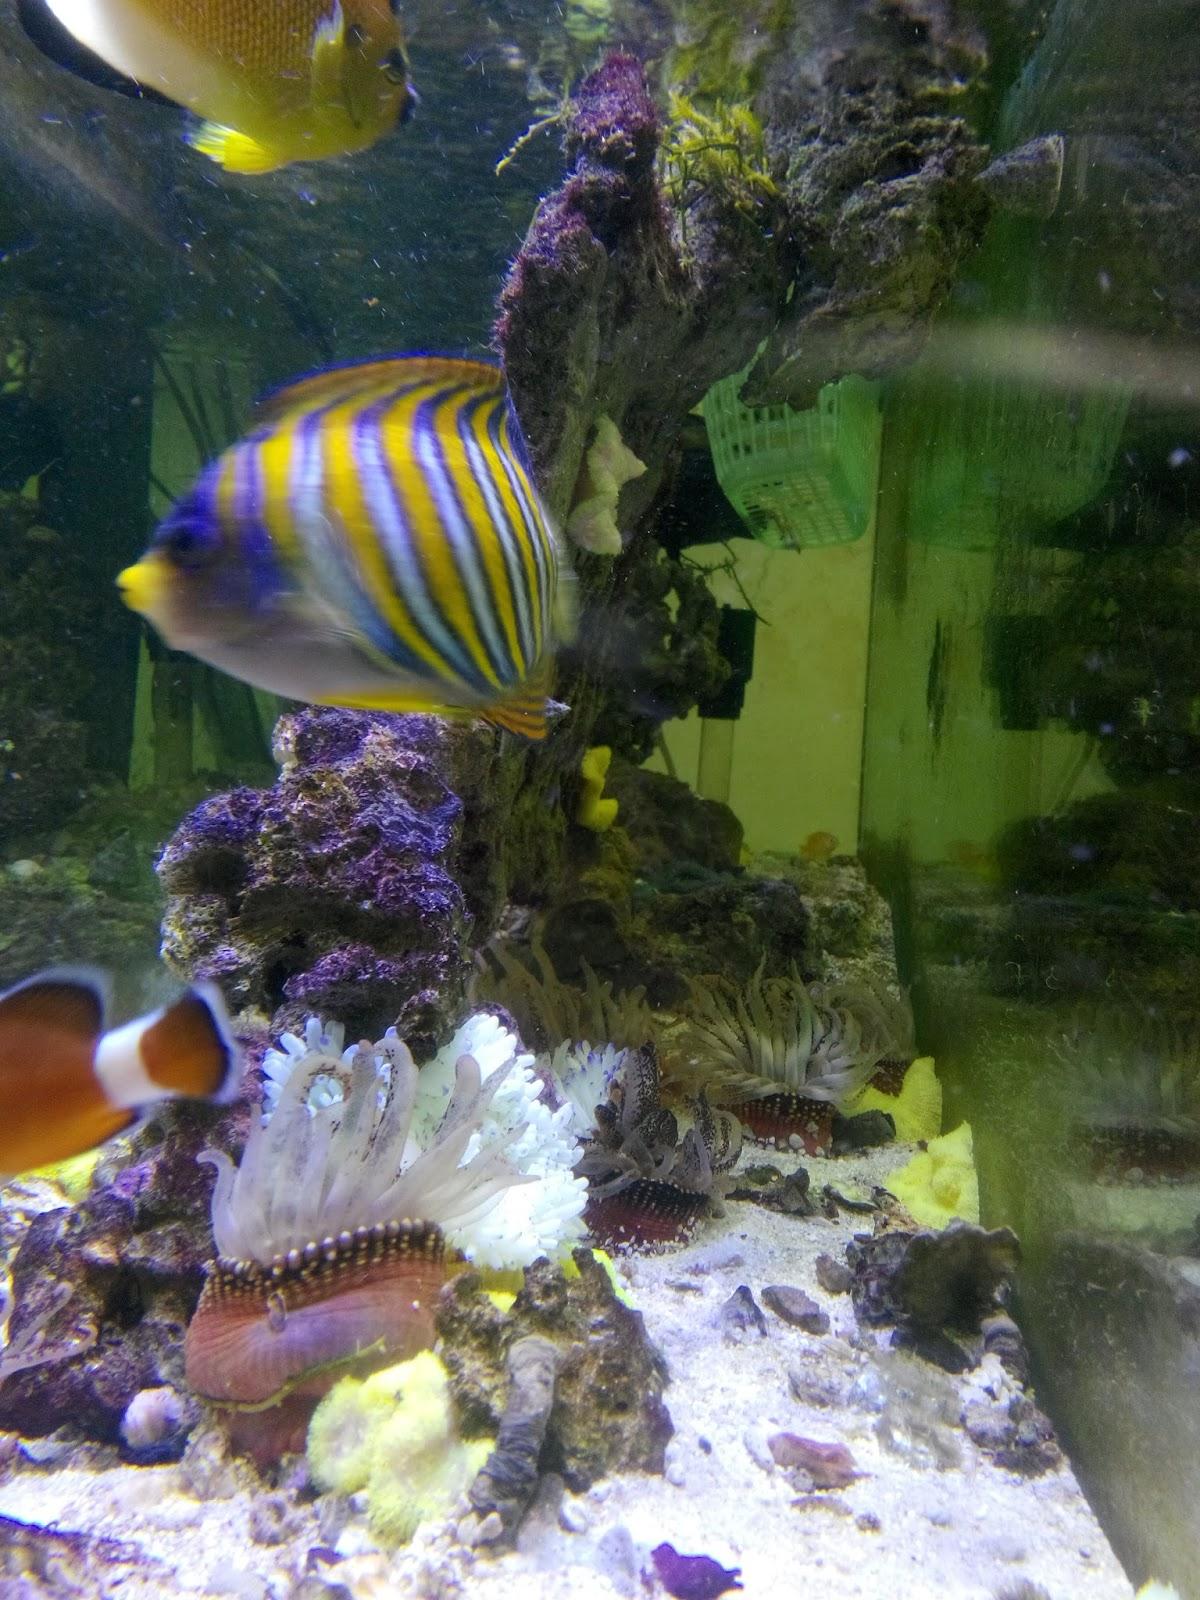 Hong kong aquarium supply hkfish2008 aquarium sea fish for Fish aquarium supplies